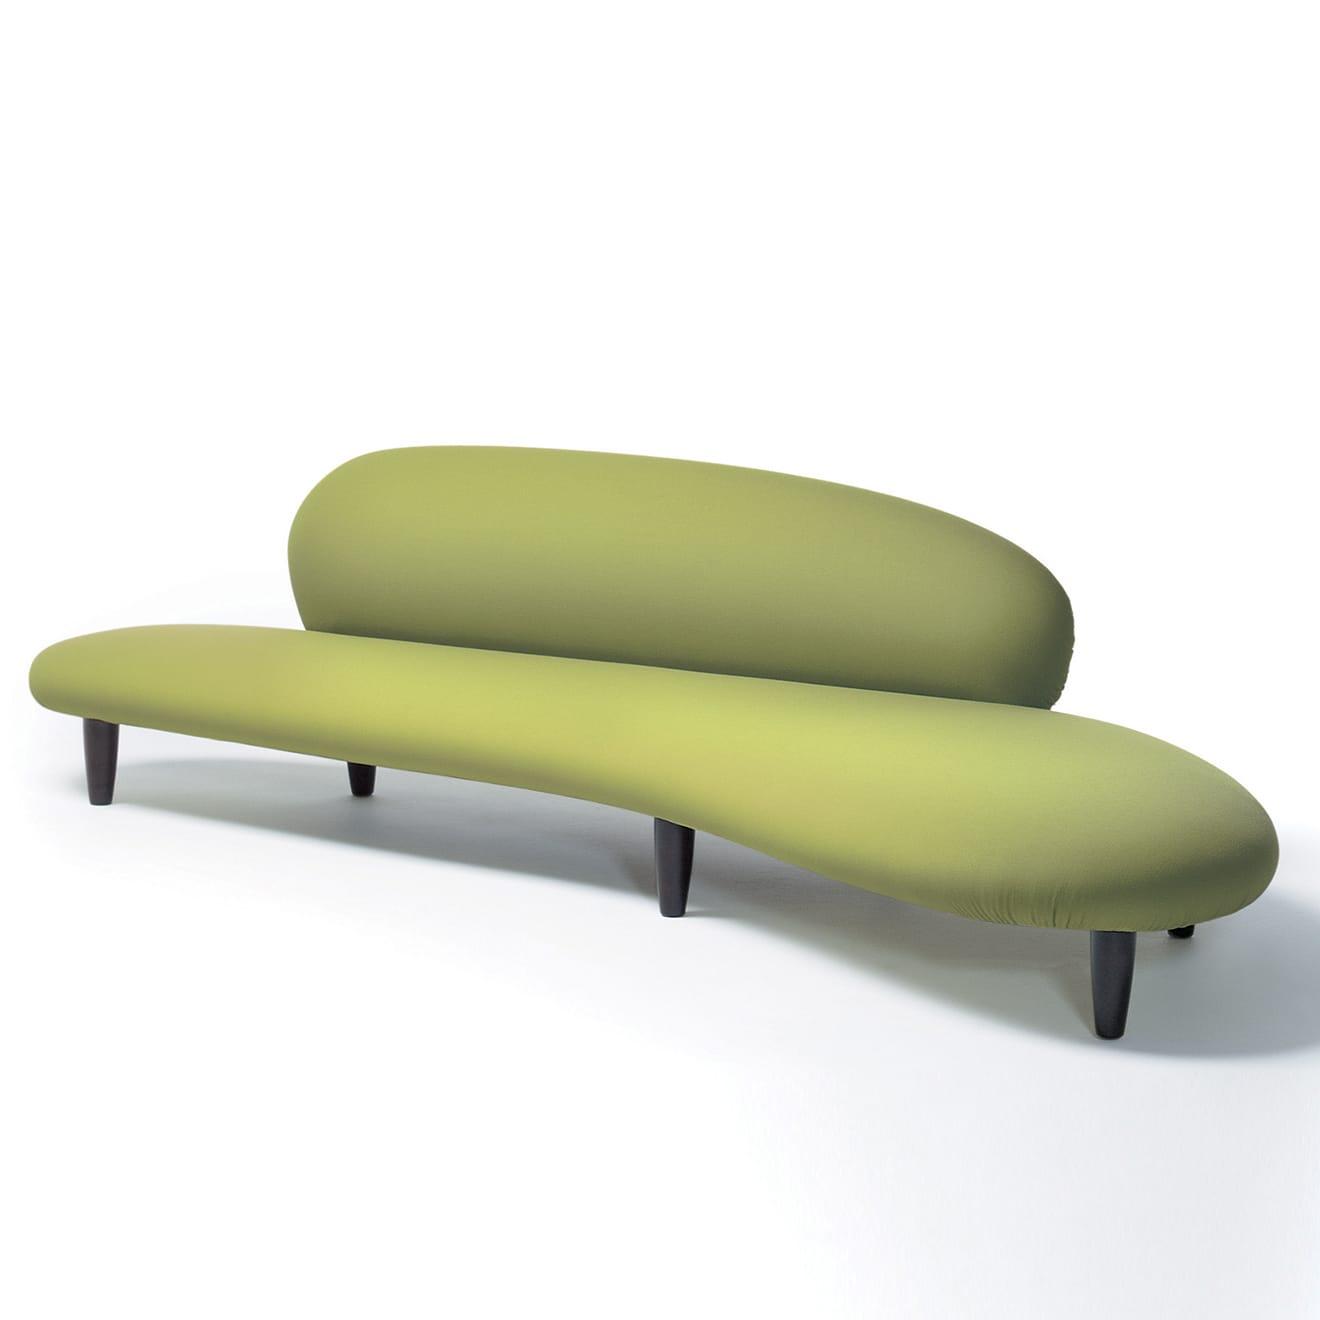 Freeform Sofa by Vitra